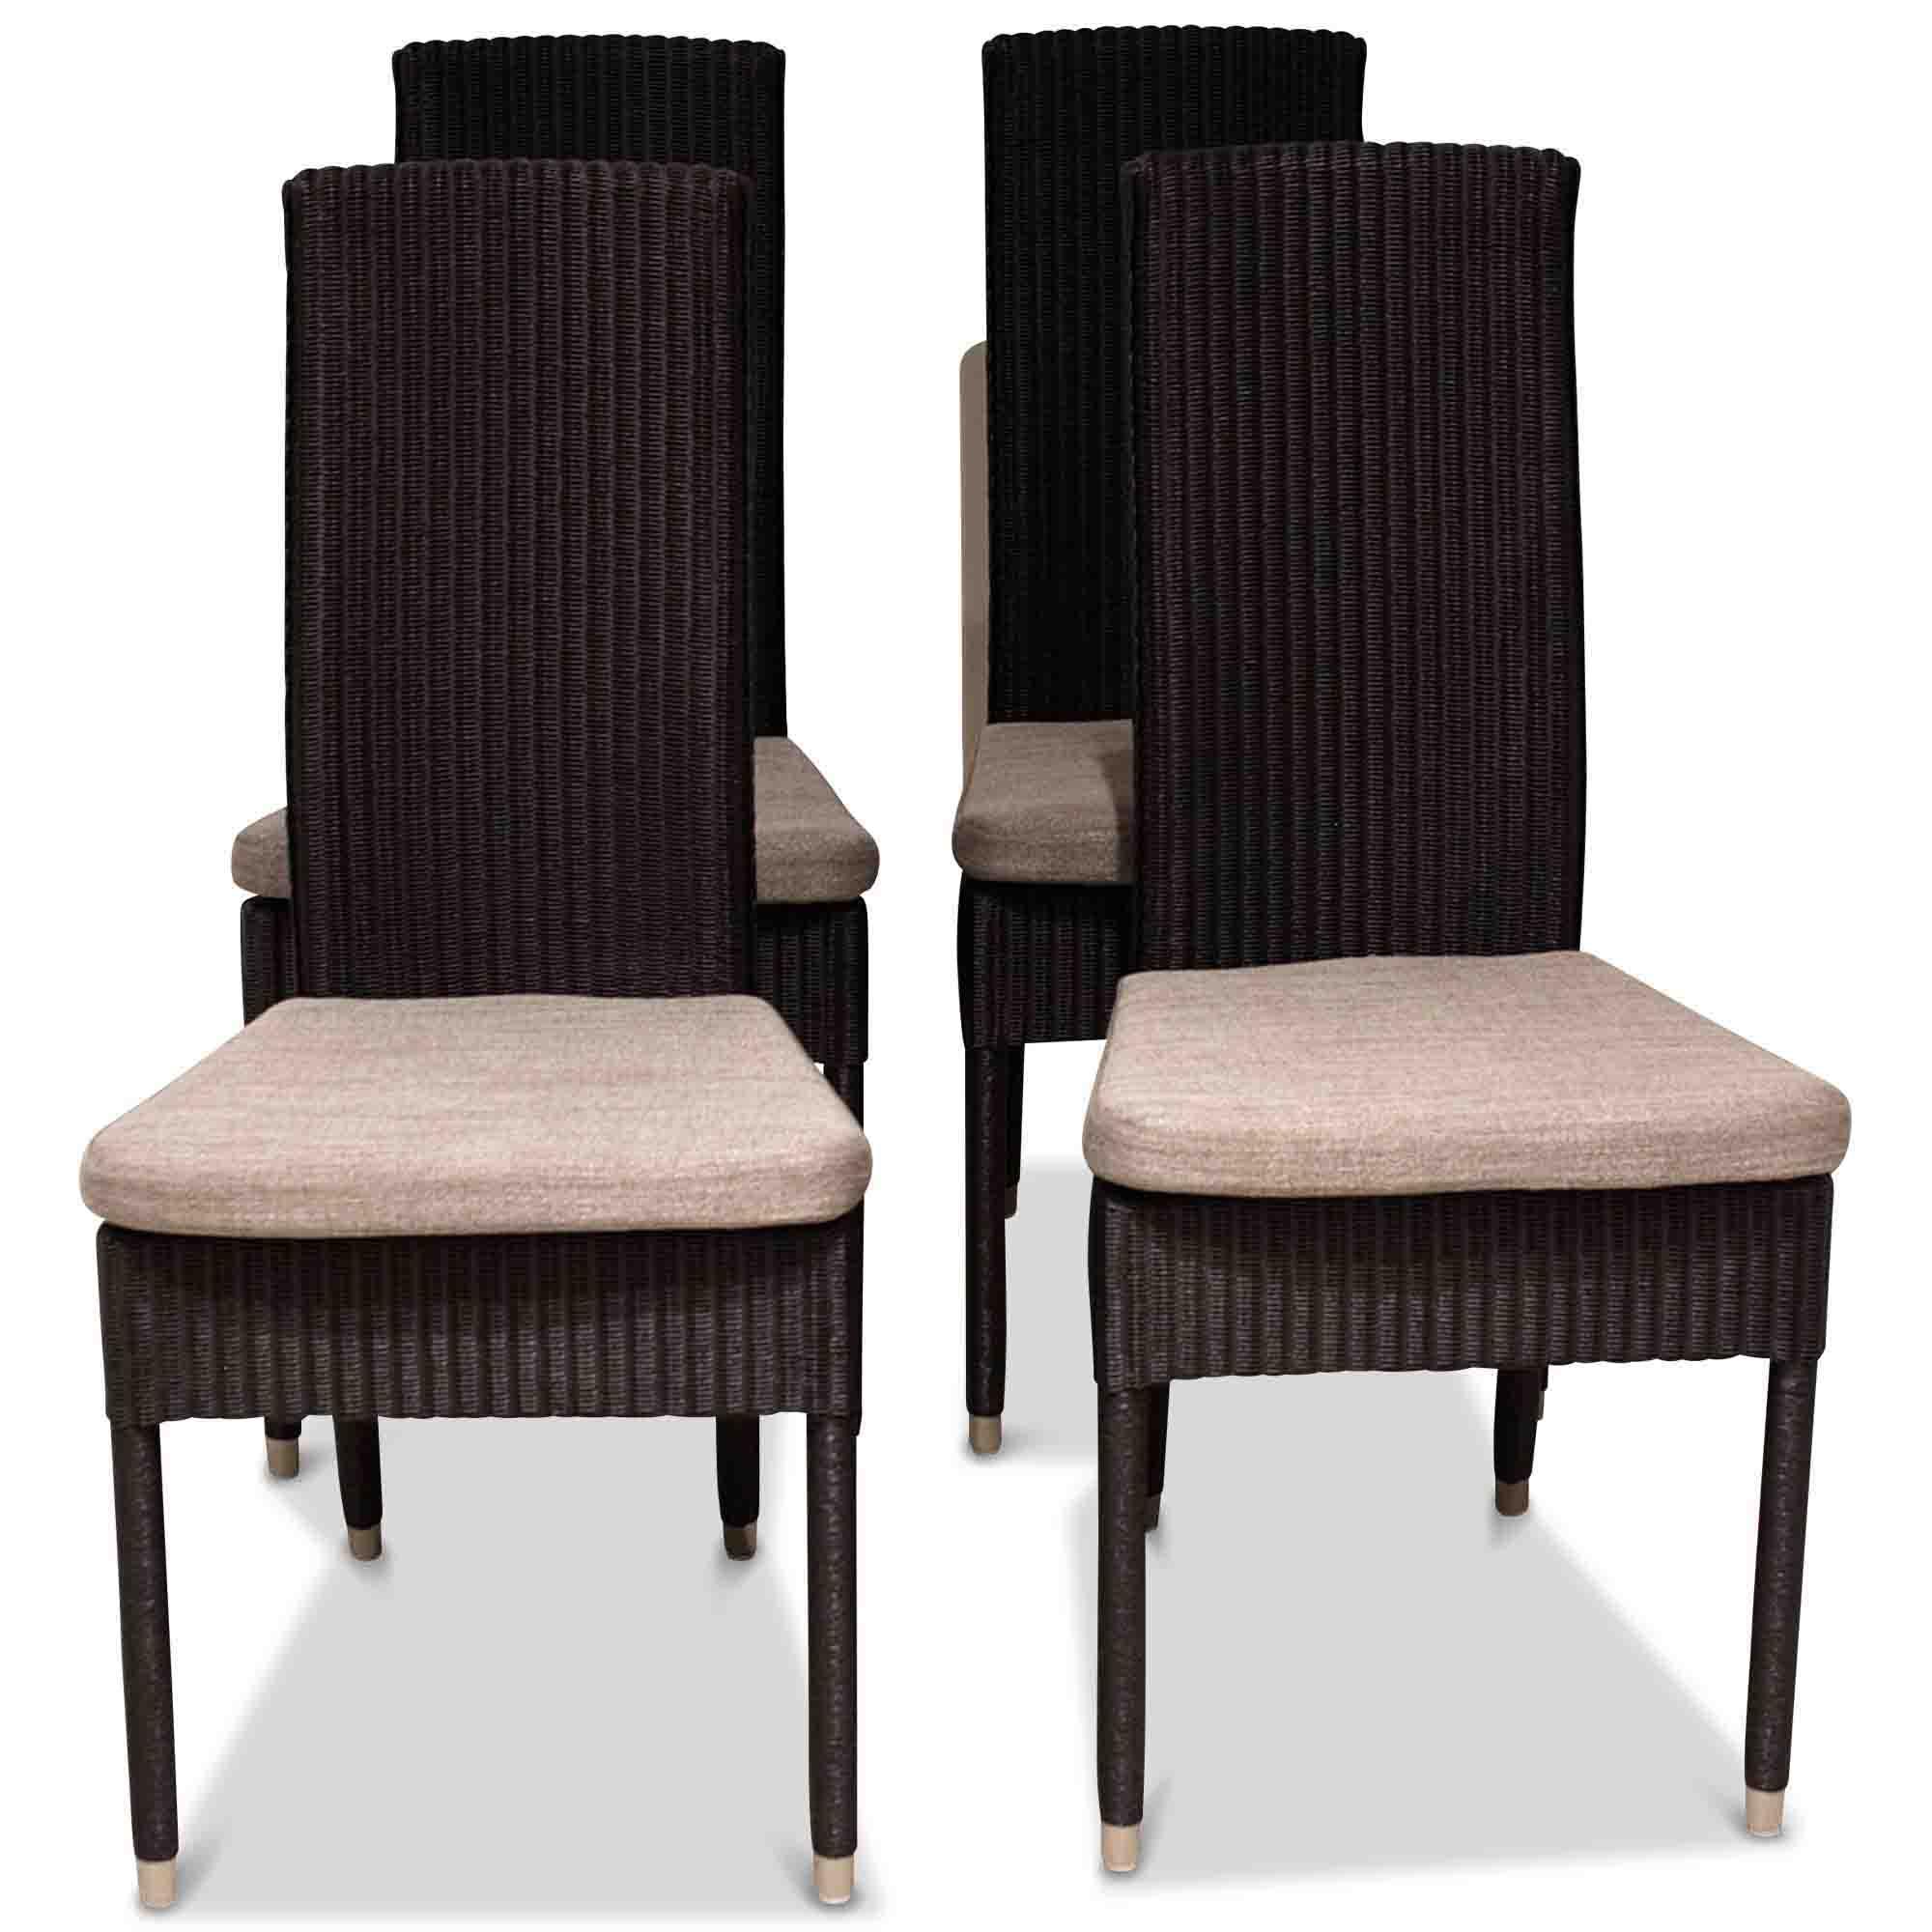 Polsterstuhl LUNA 4er Set – Accente – Stühle – Günstig